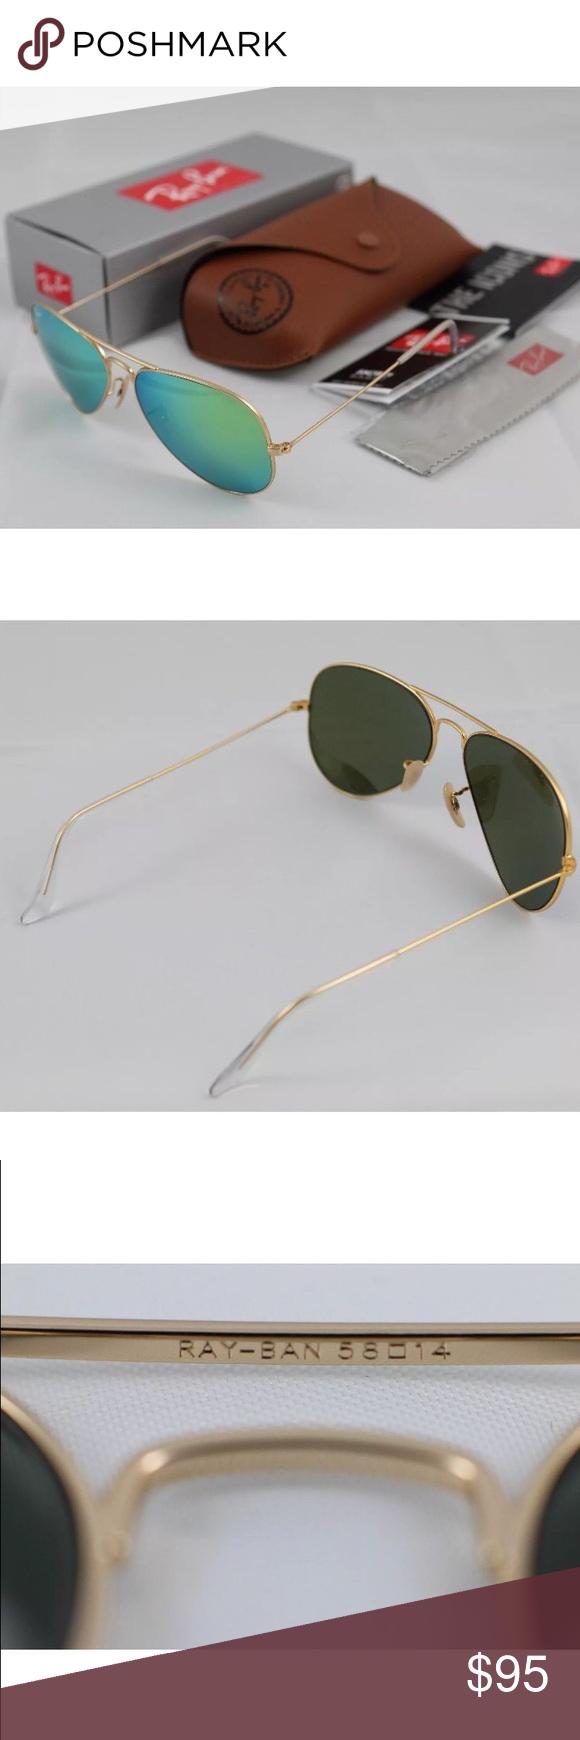 02294dd1d4b 100%AUTHENTIC Ray-Ban aviator flash green lens Ray-Ban 3025 Aviator  Sunglasses Model  RB3025 AVIATOR LARGE METAL 112 19 58014 3N Gold Wire Ray-Ban  Aviators ...